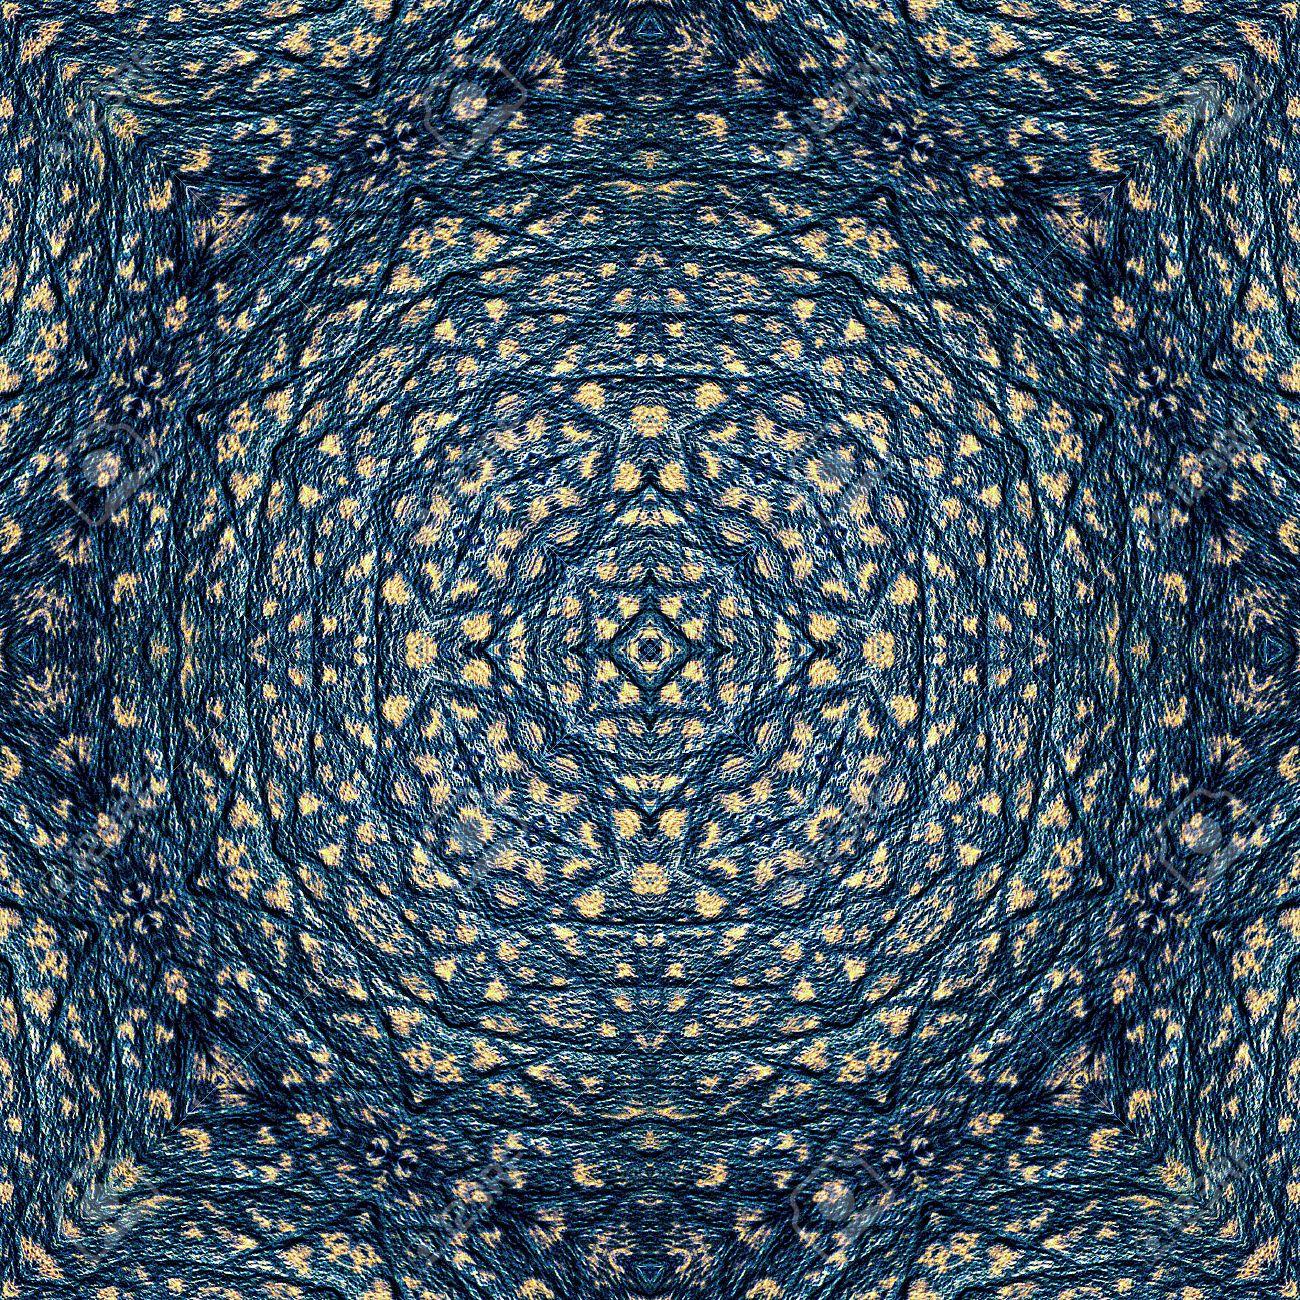 Resume Motif Bleu Ressemblant Tapis Oriental Avec Motif Ornemental